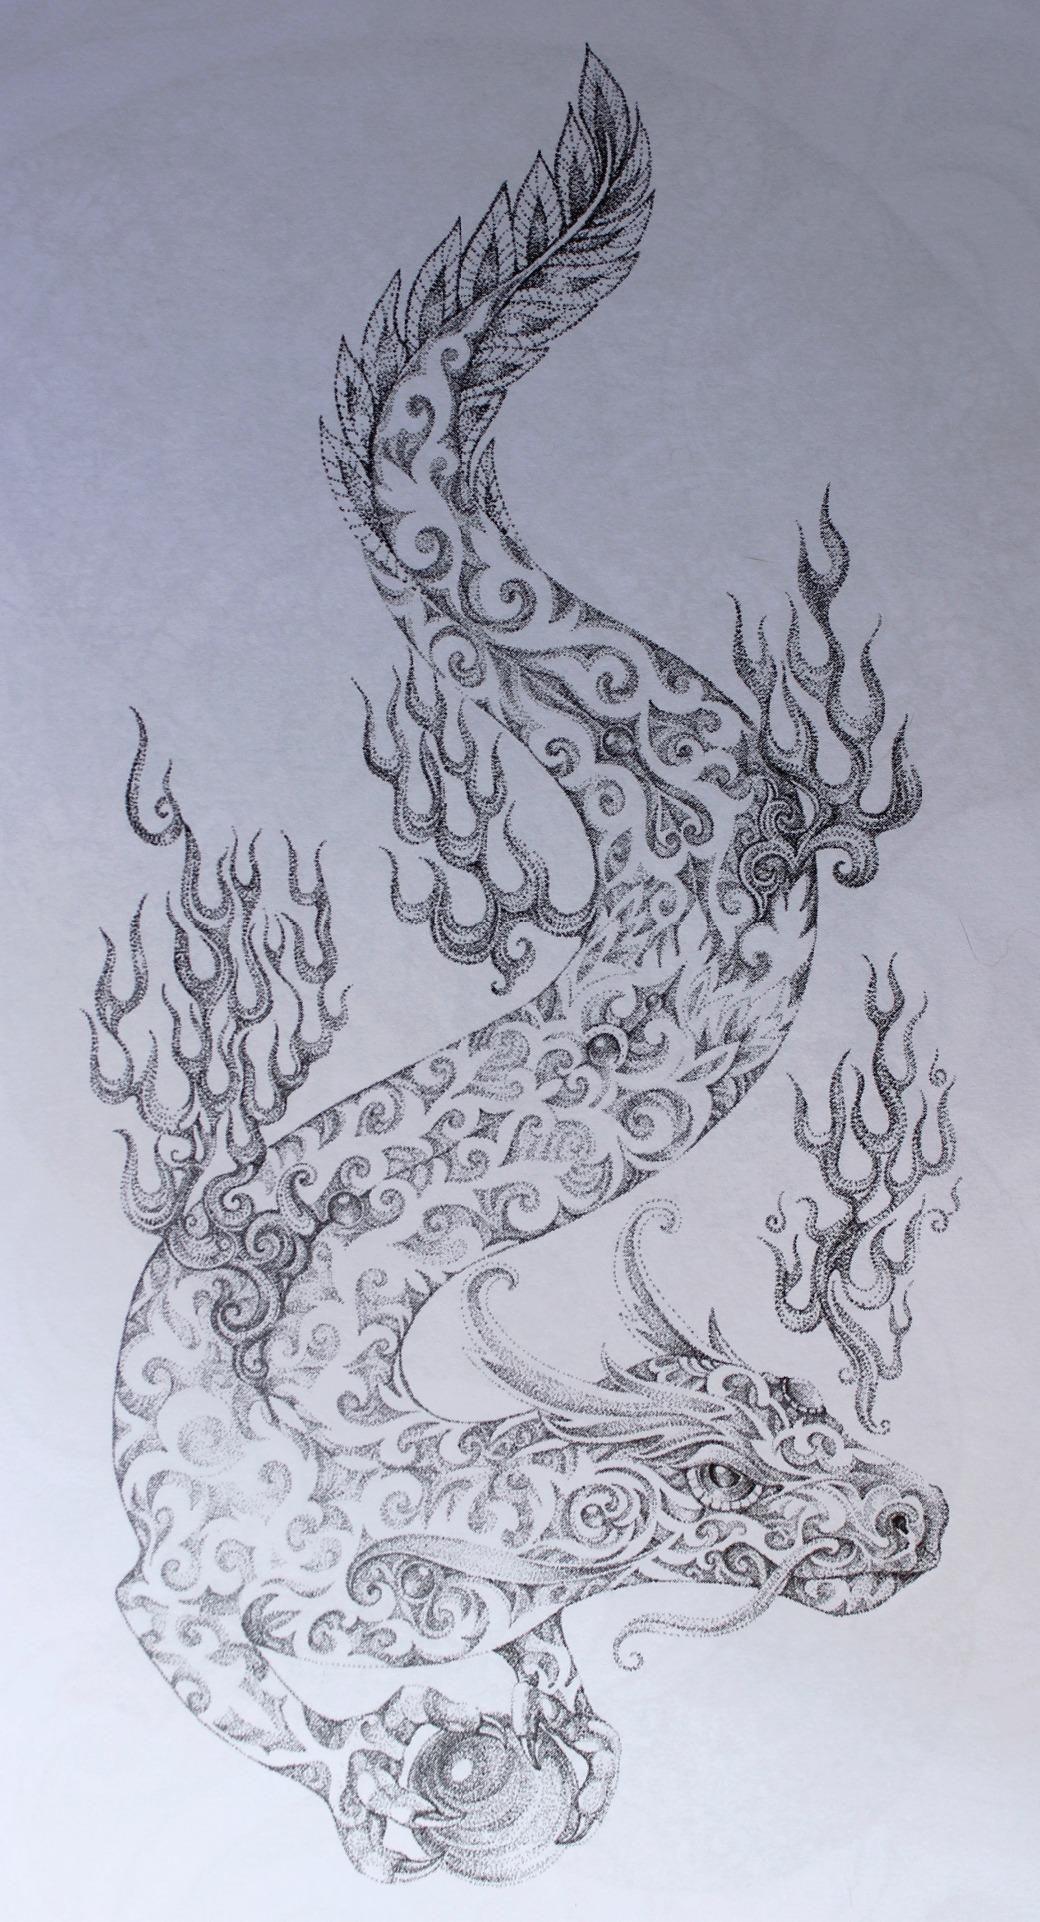 Spirit Animals Mandalas People Coloring Books For Grownups Adults Cheryl